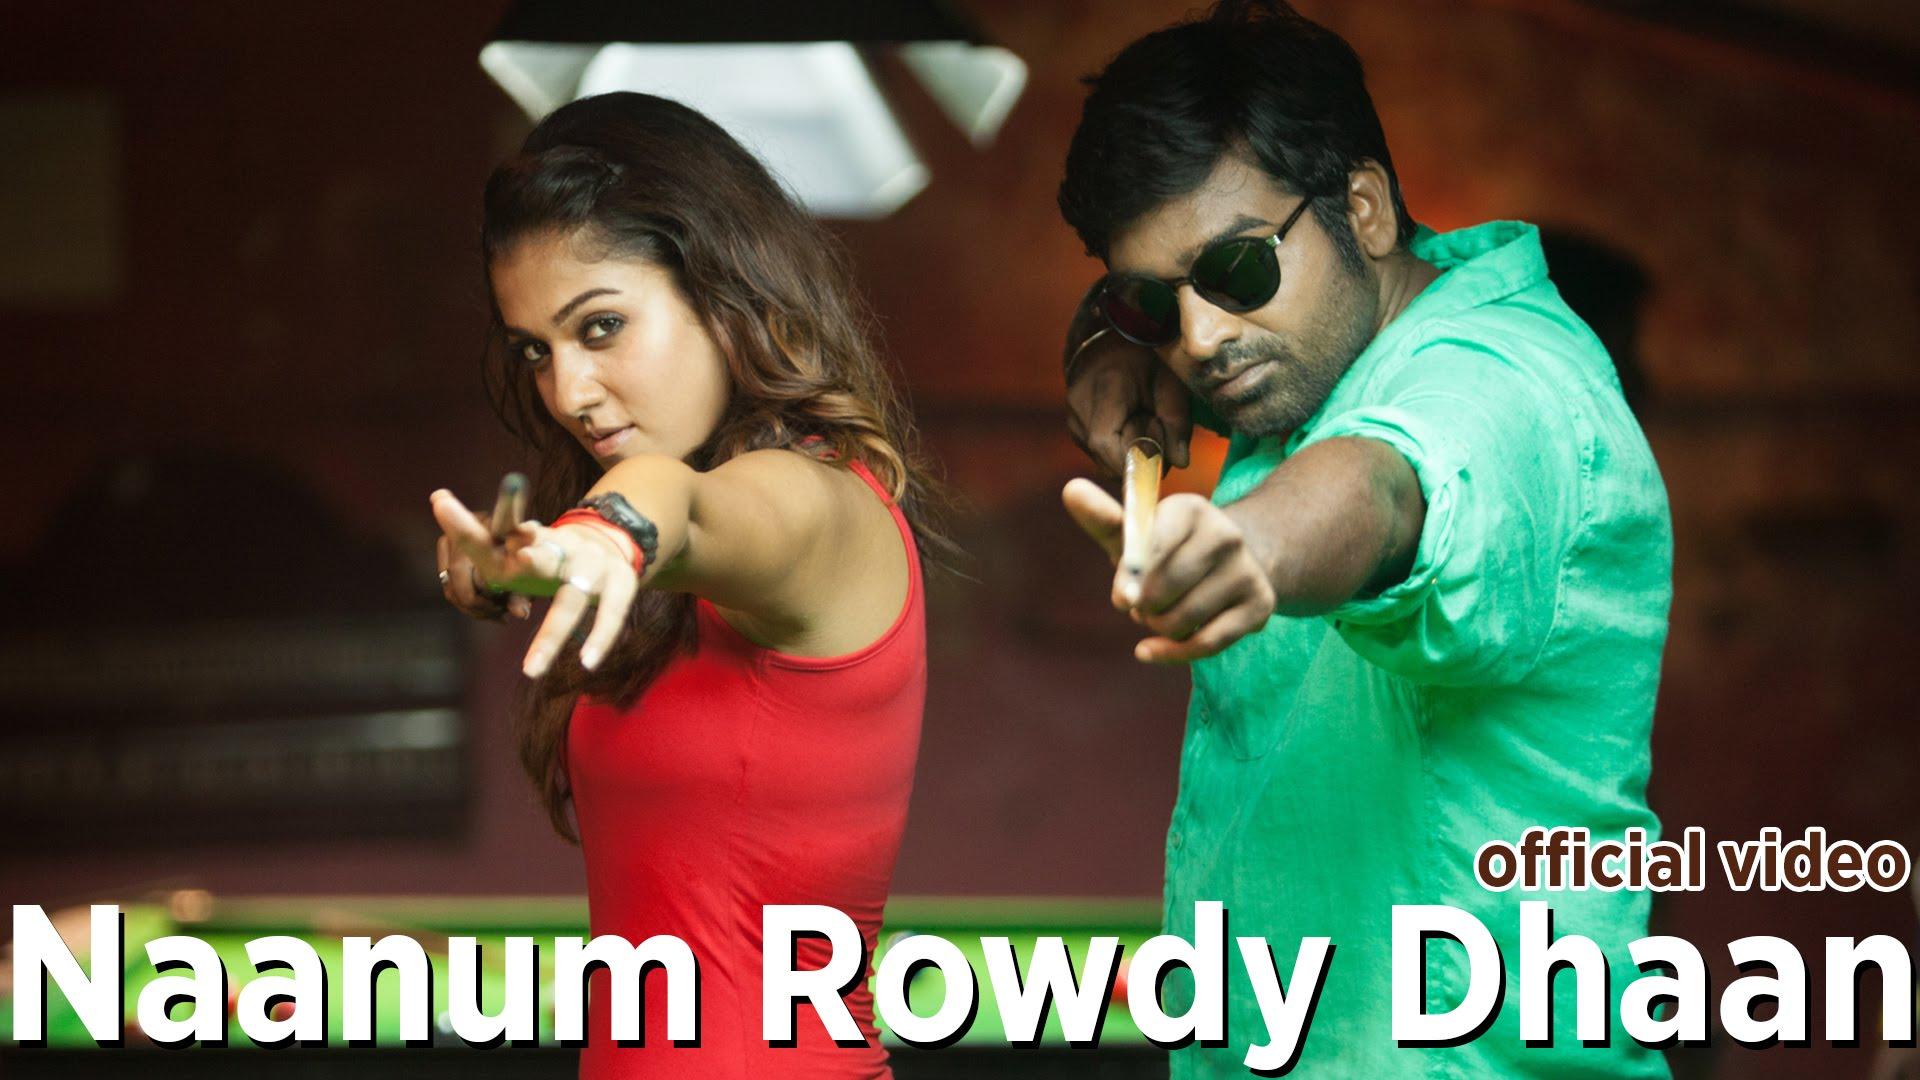 Naanum Rowdy Dhaan – Title Track | Official Video | Anirudh | Vijay Sethupathi,Nayanthara